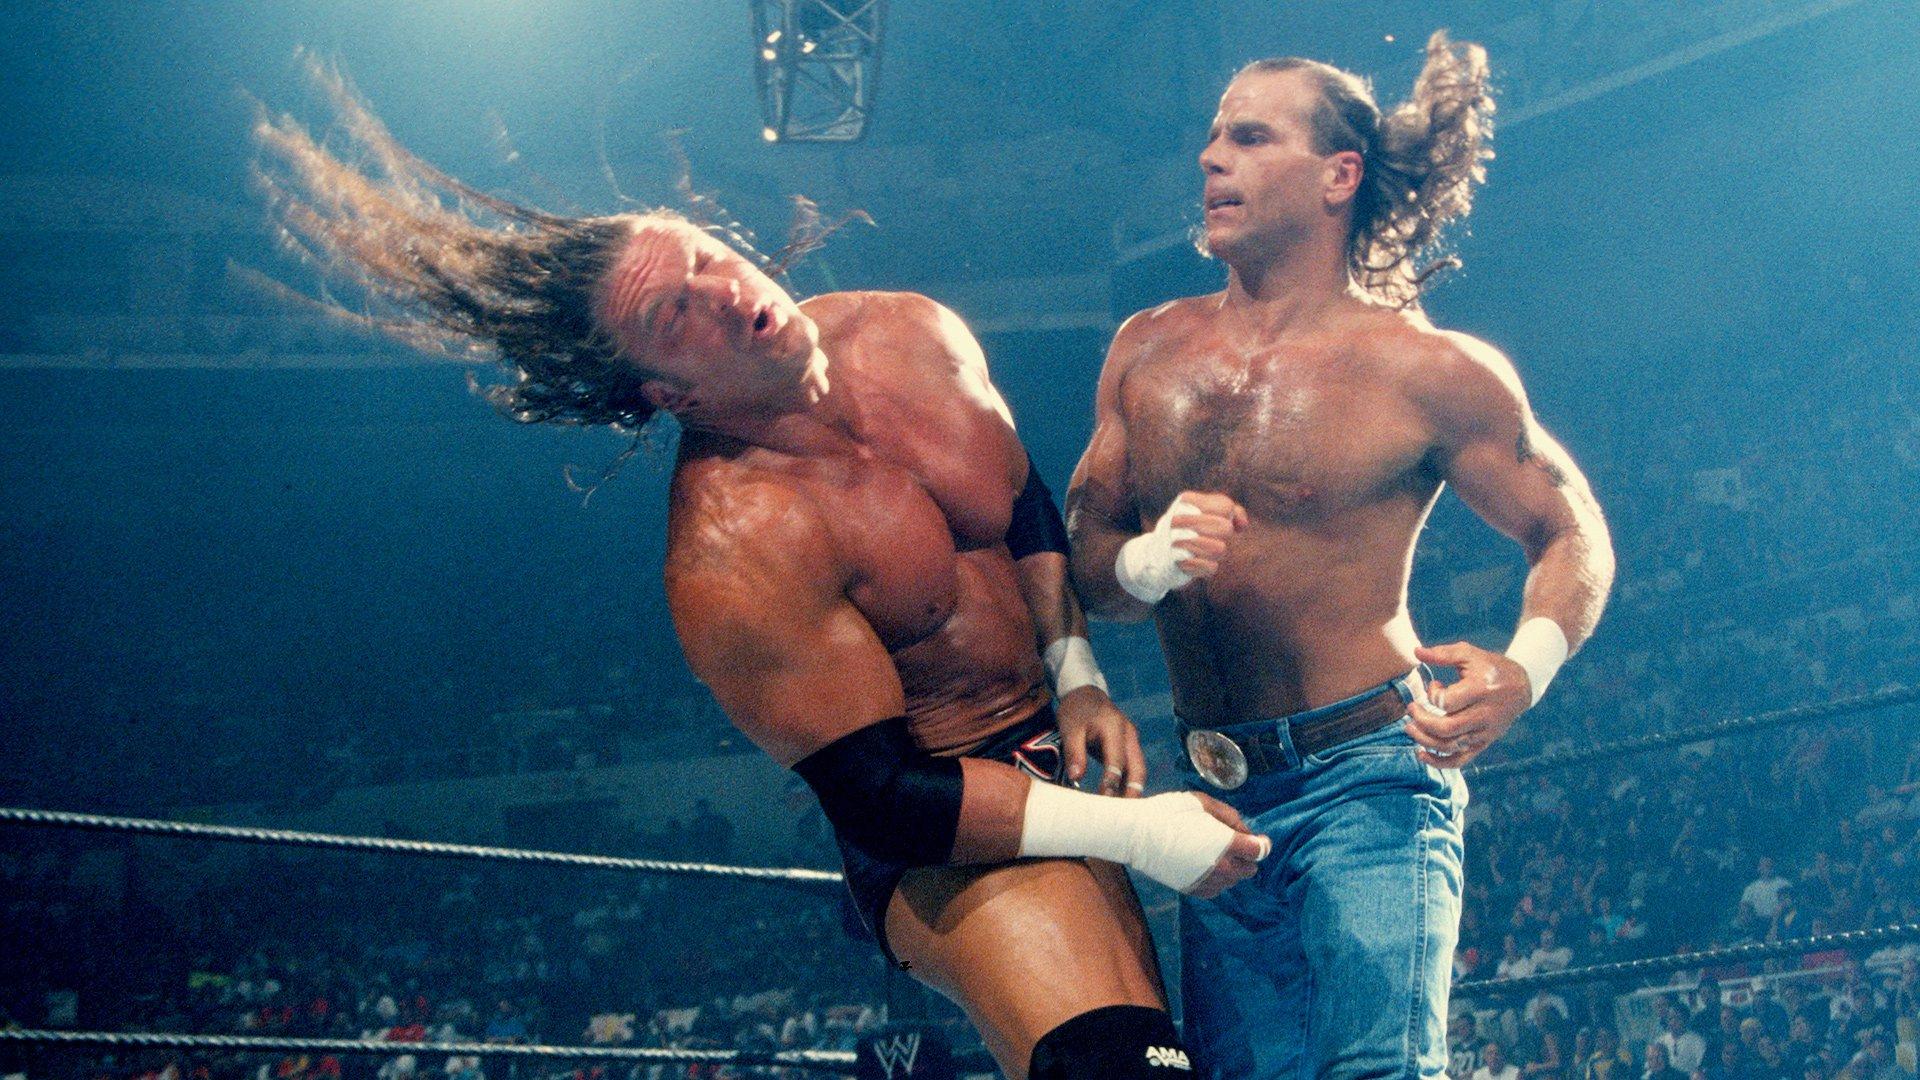 Shawn michaels vs triple h street fight summerslam 2002 wwe m4hsunfo